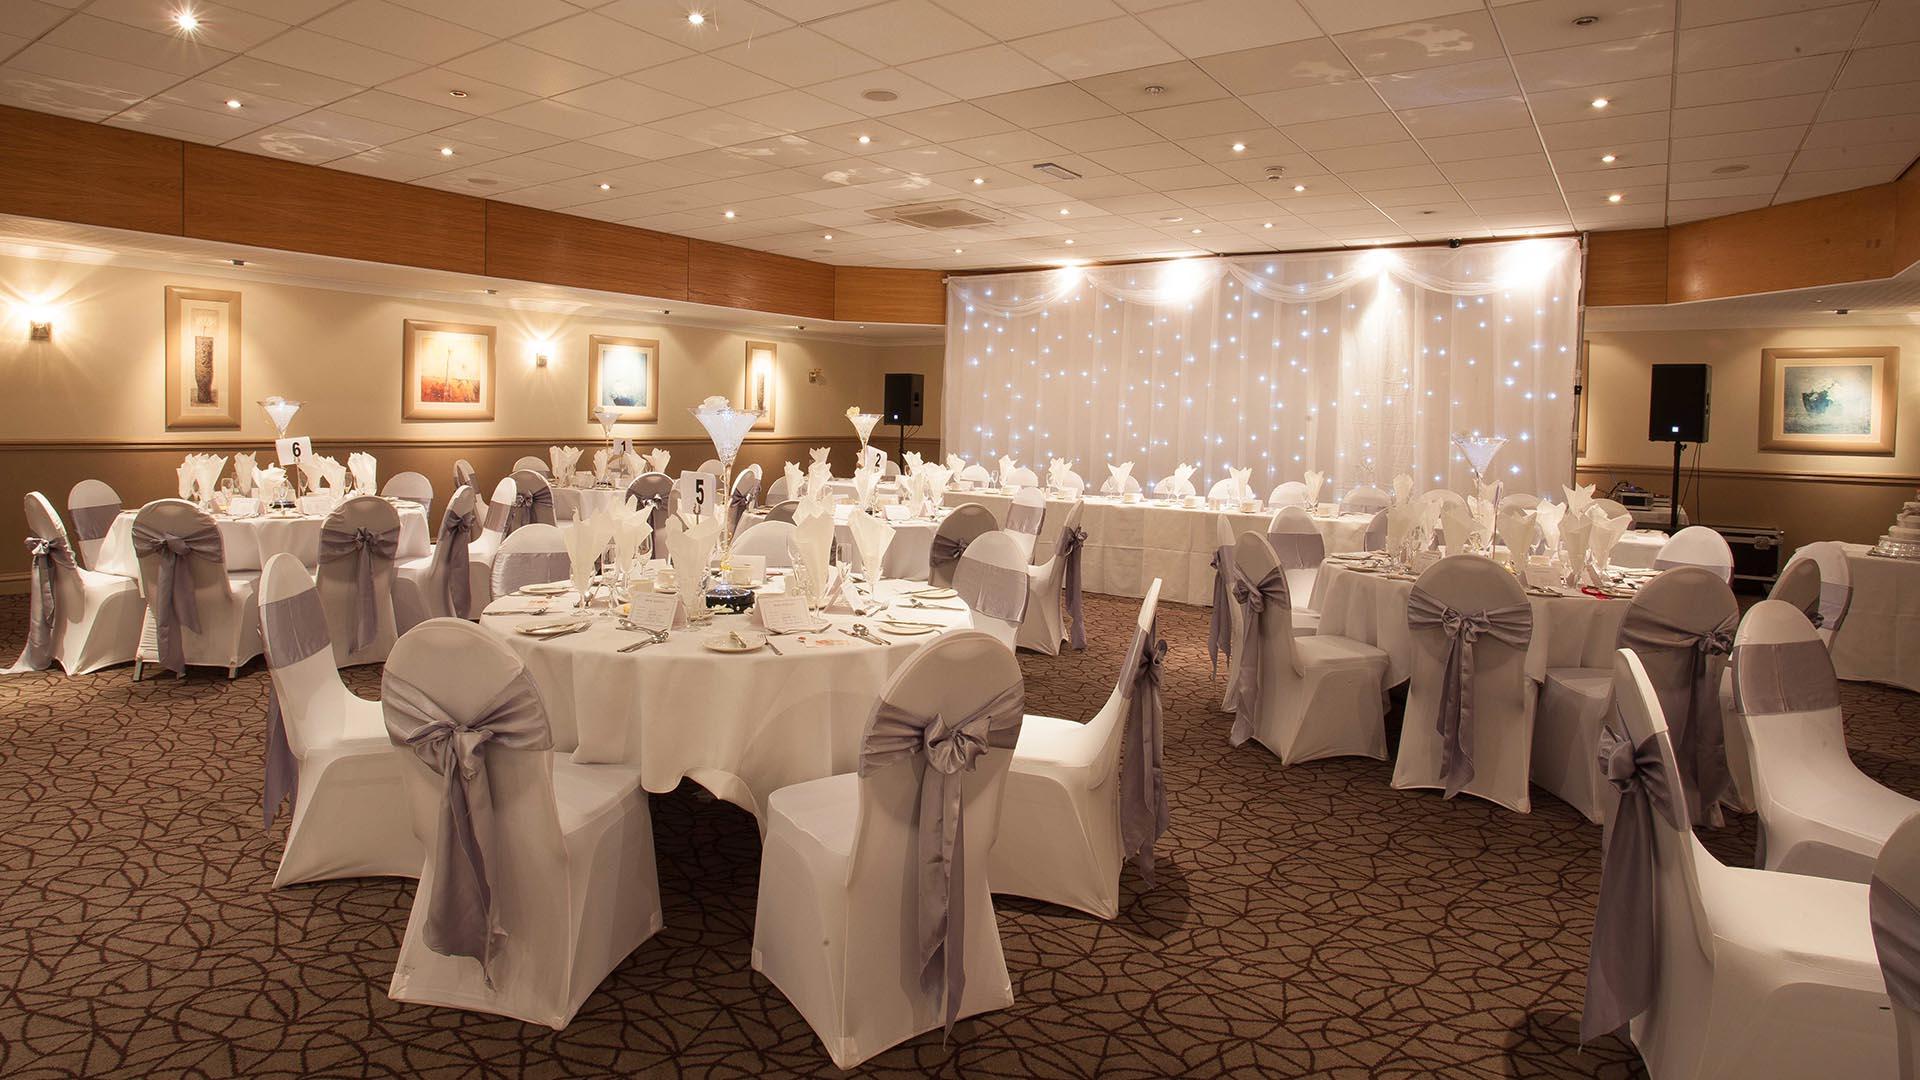 Decor 5 Wedding venues in Manchester and Cheshire Best Western Manchester Altrincham Cresta Court Hotel